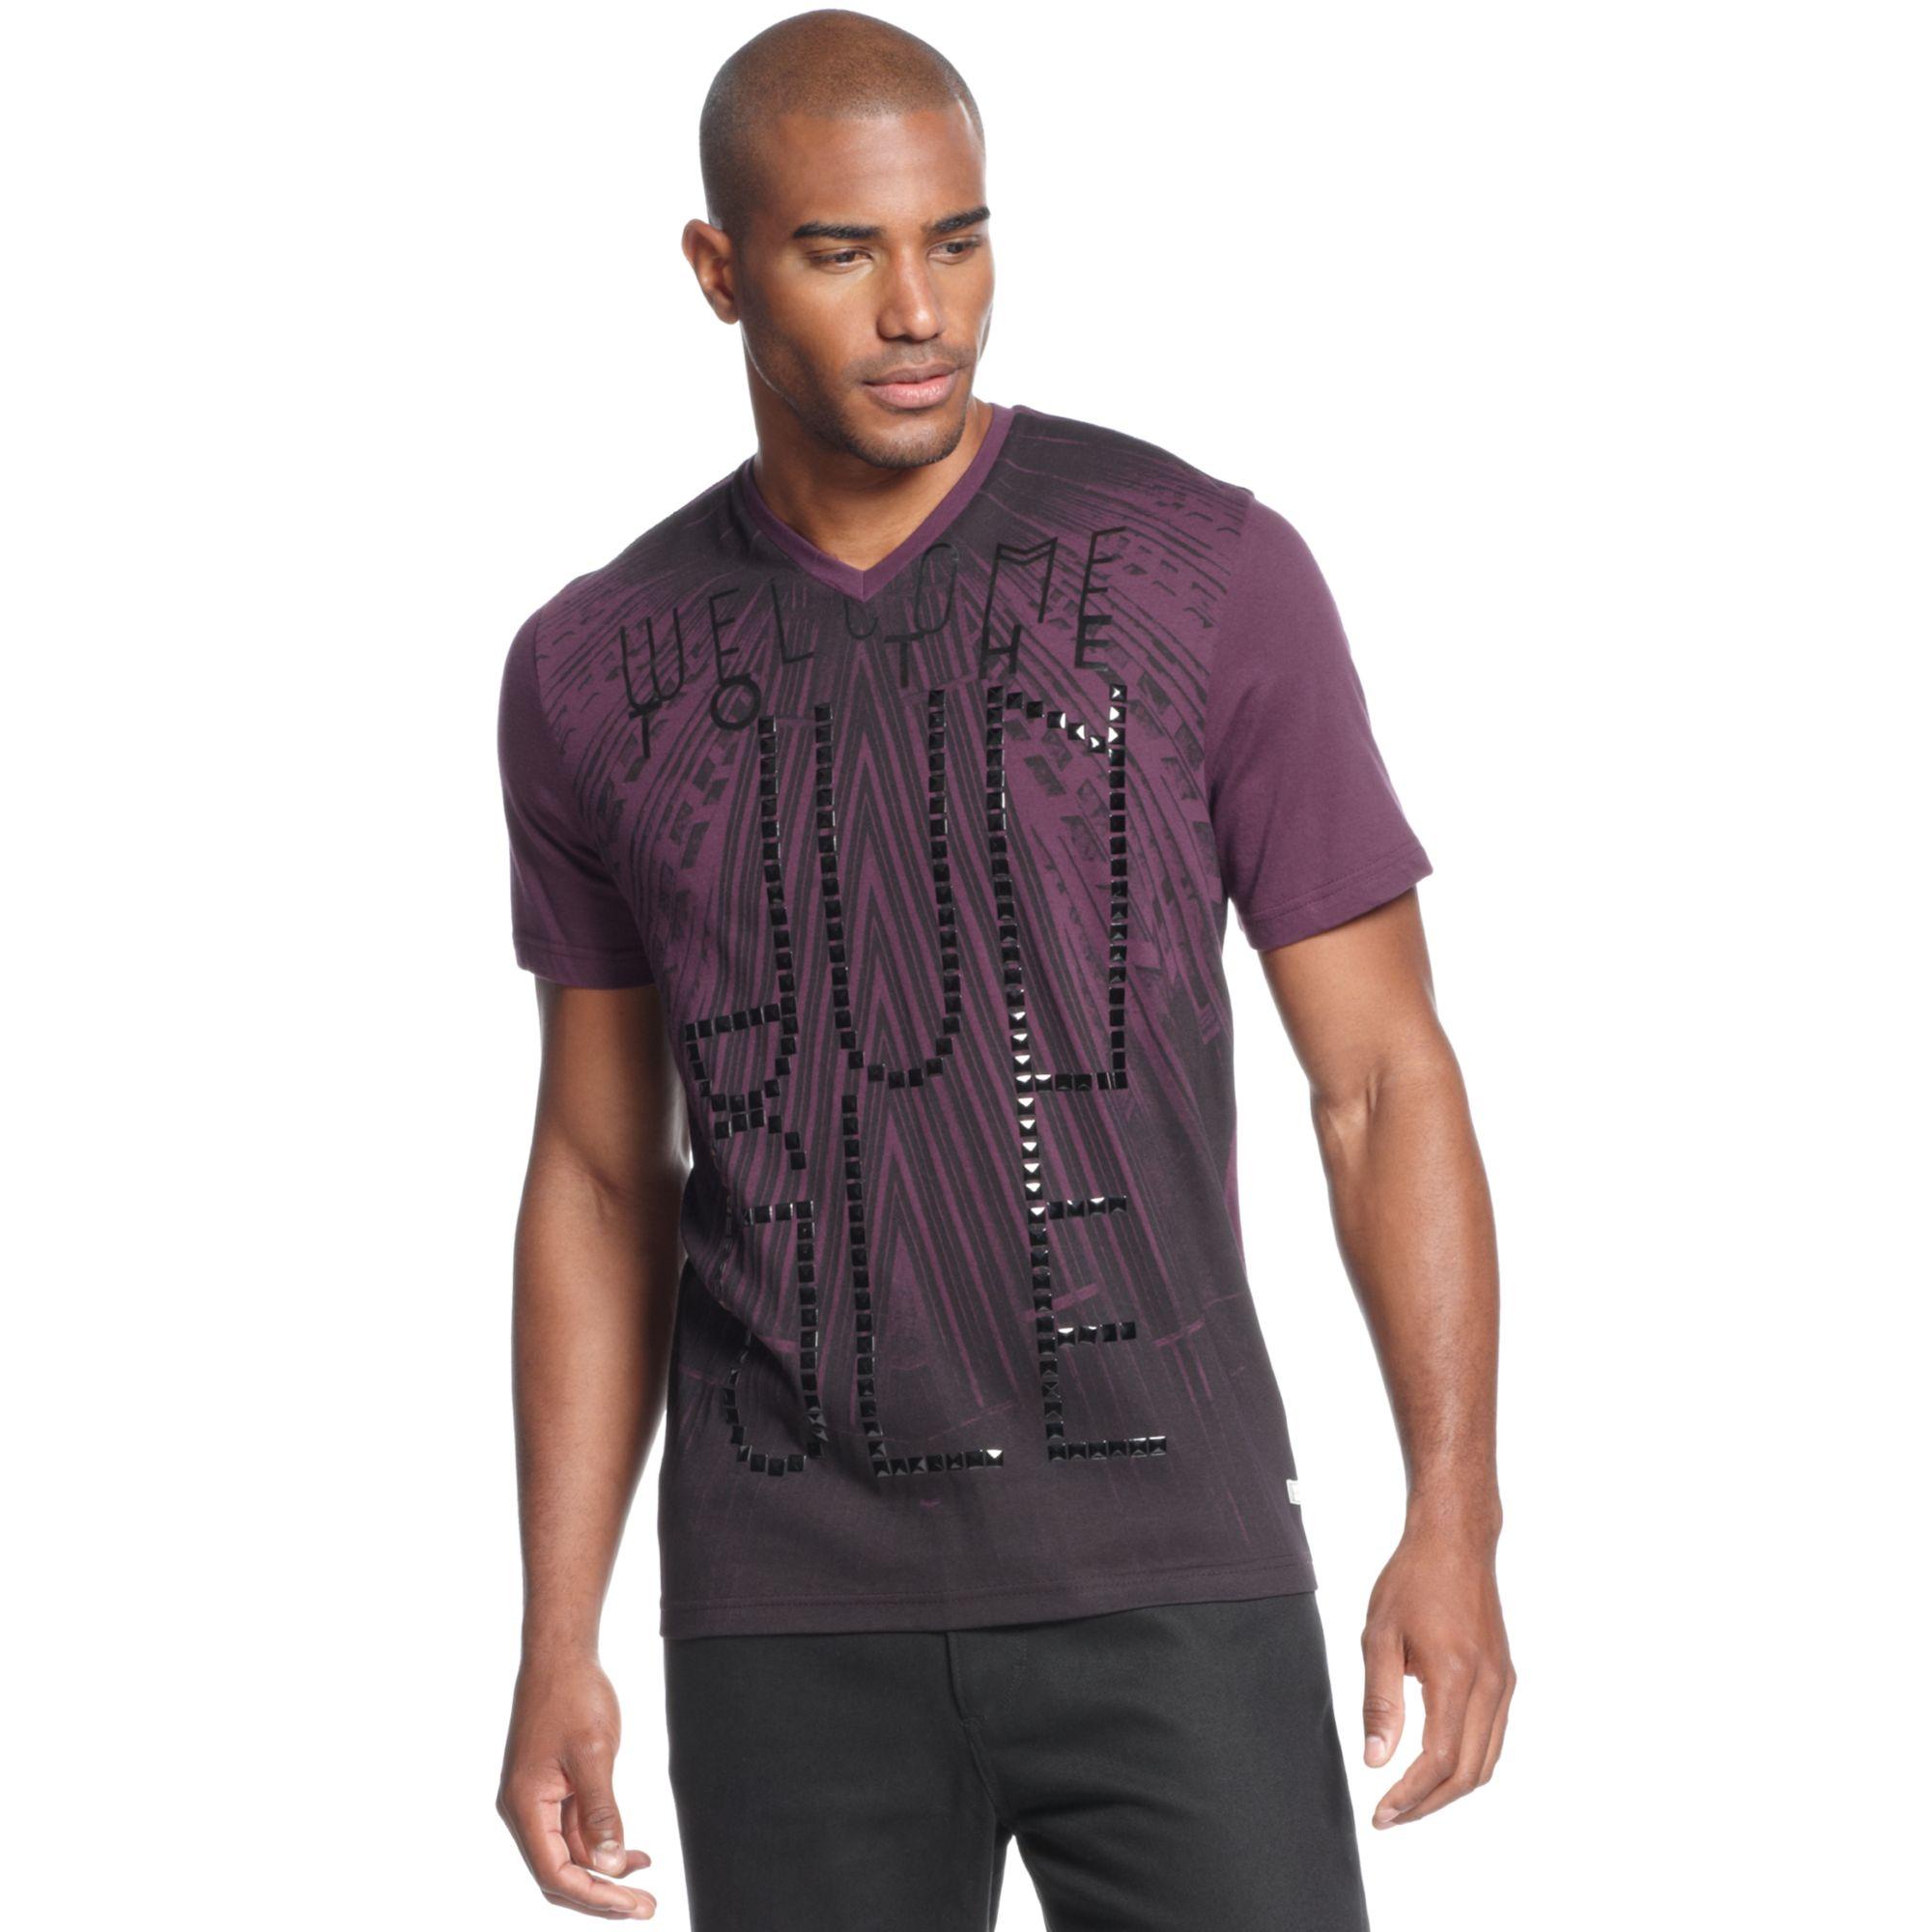 Sean john jungle v neck t shirt in purple for men lyst for Sean john t shirts for mens